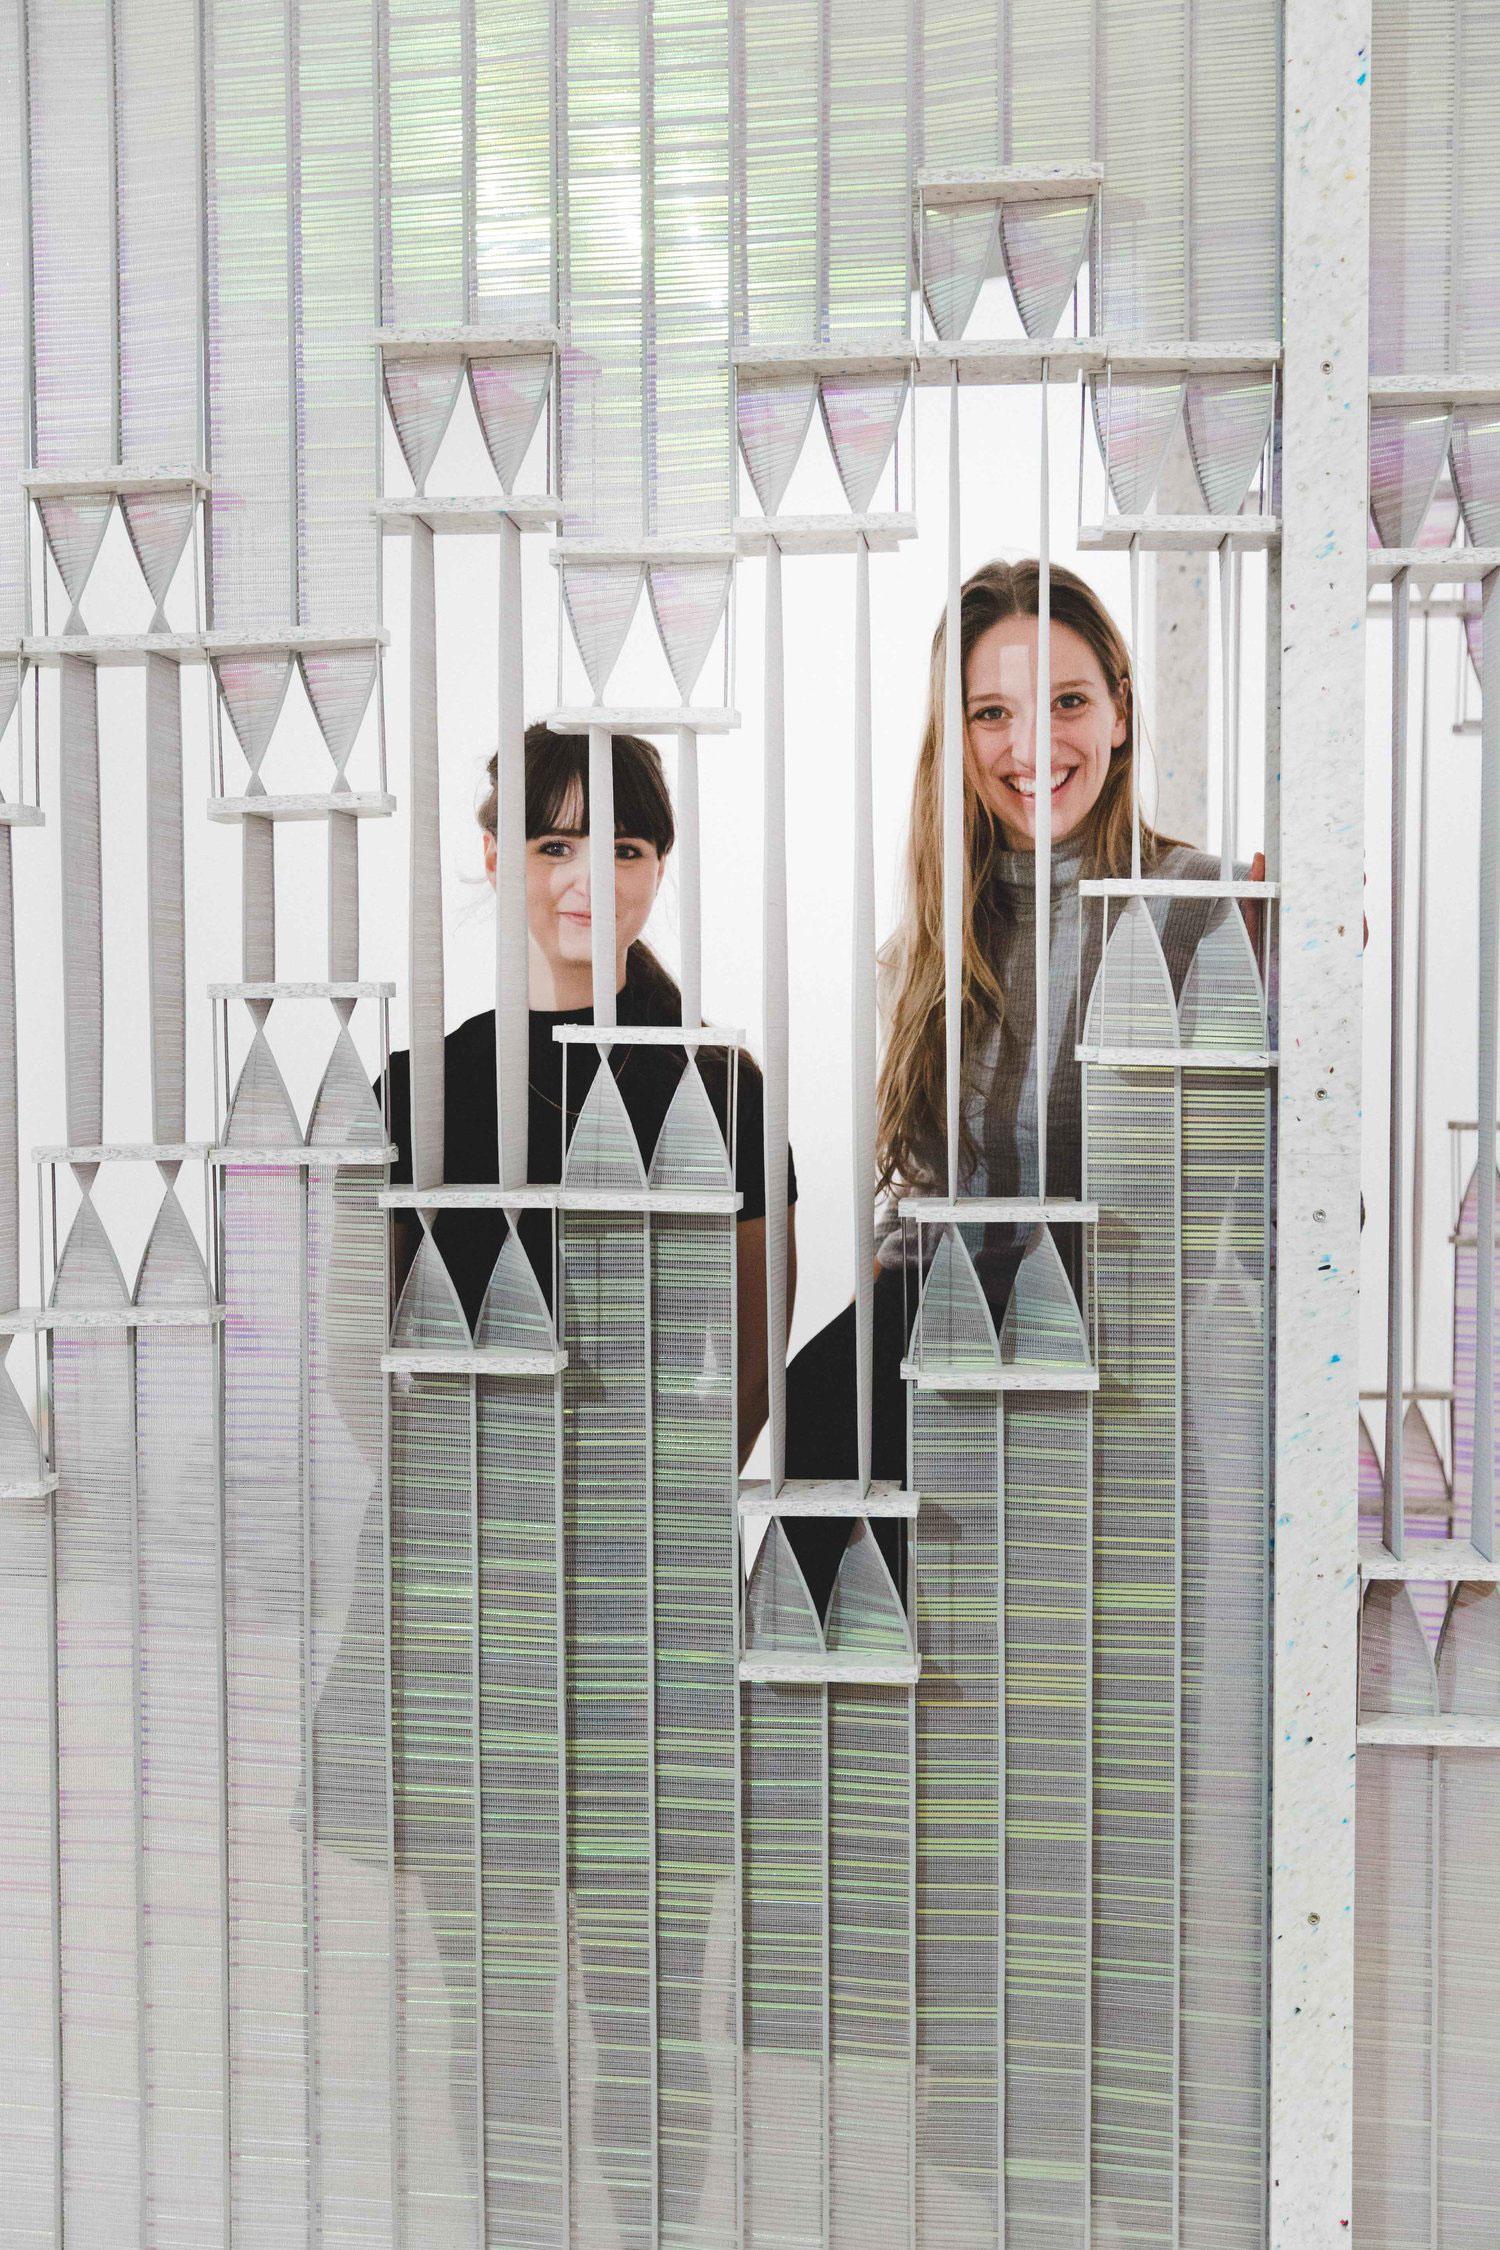 Unusual window treatment, the KUFtwist blind by designers Kia Utzon-Frank and Fay McCaul